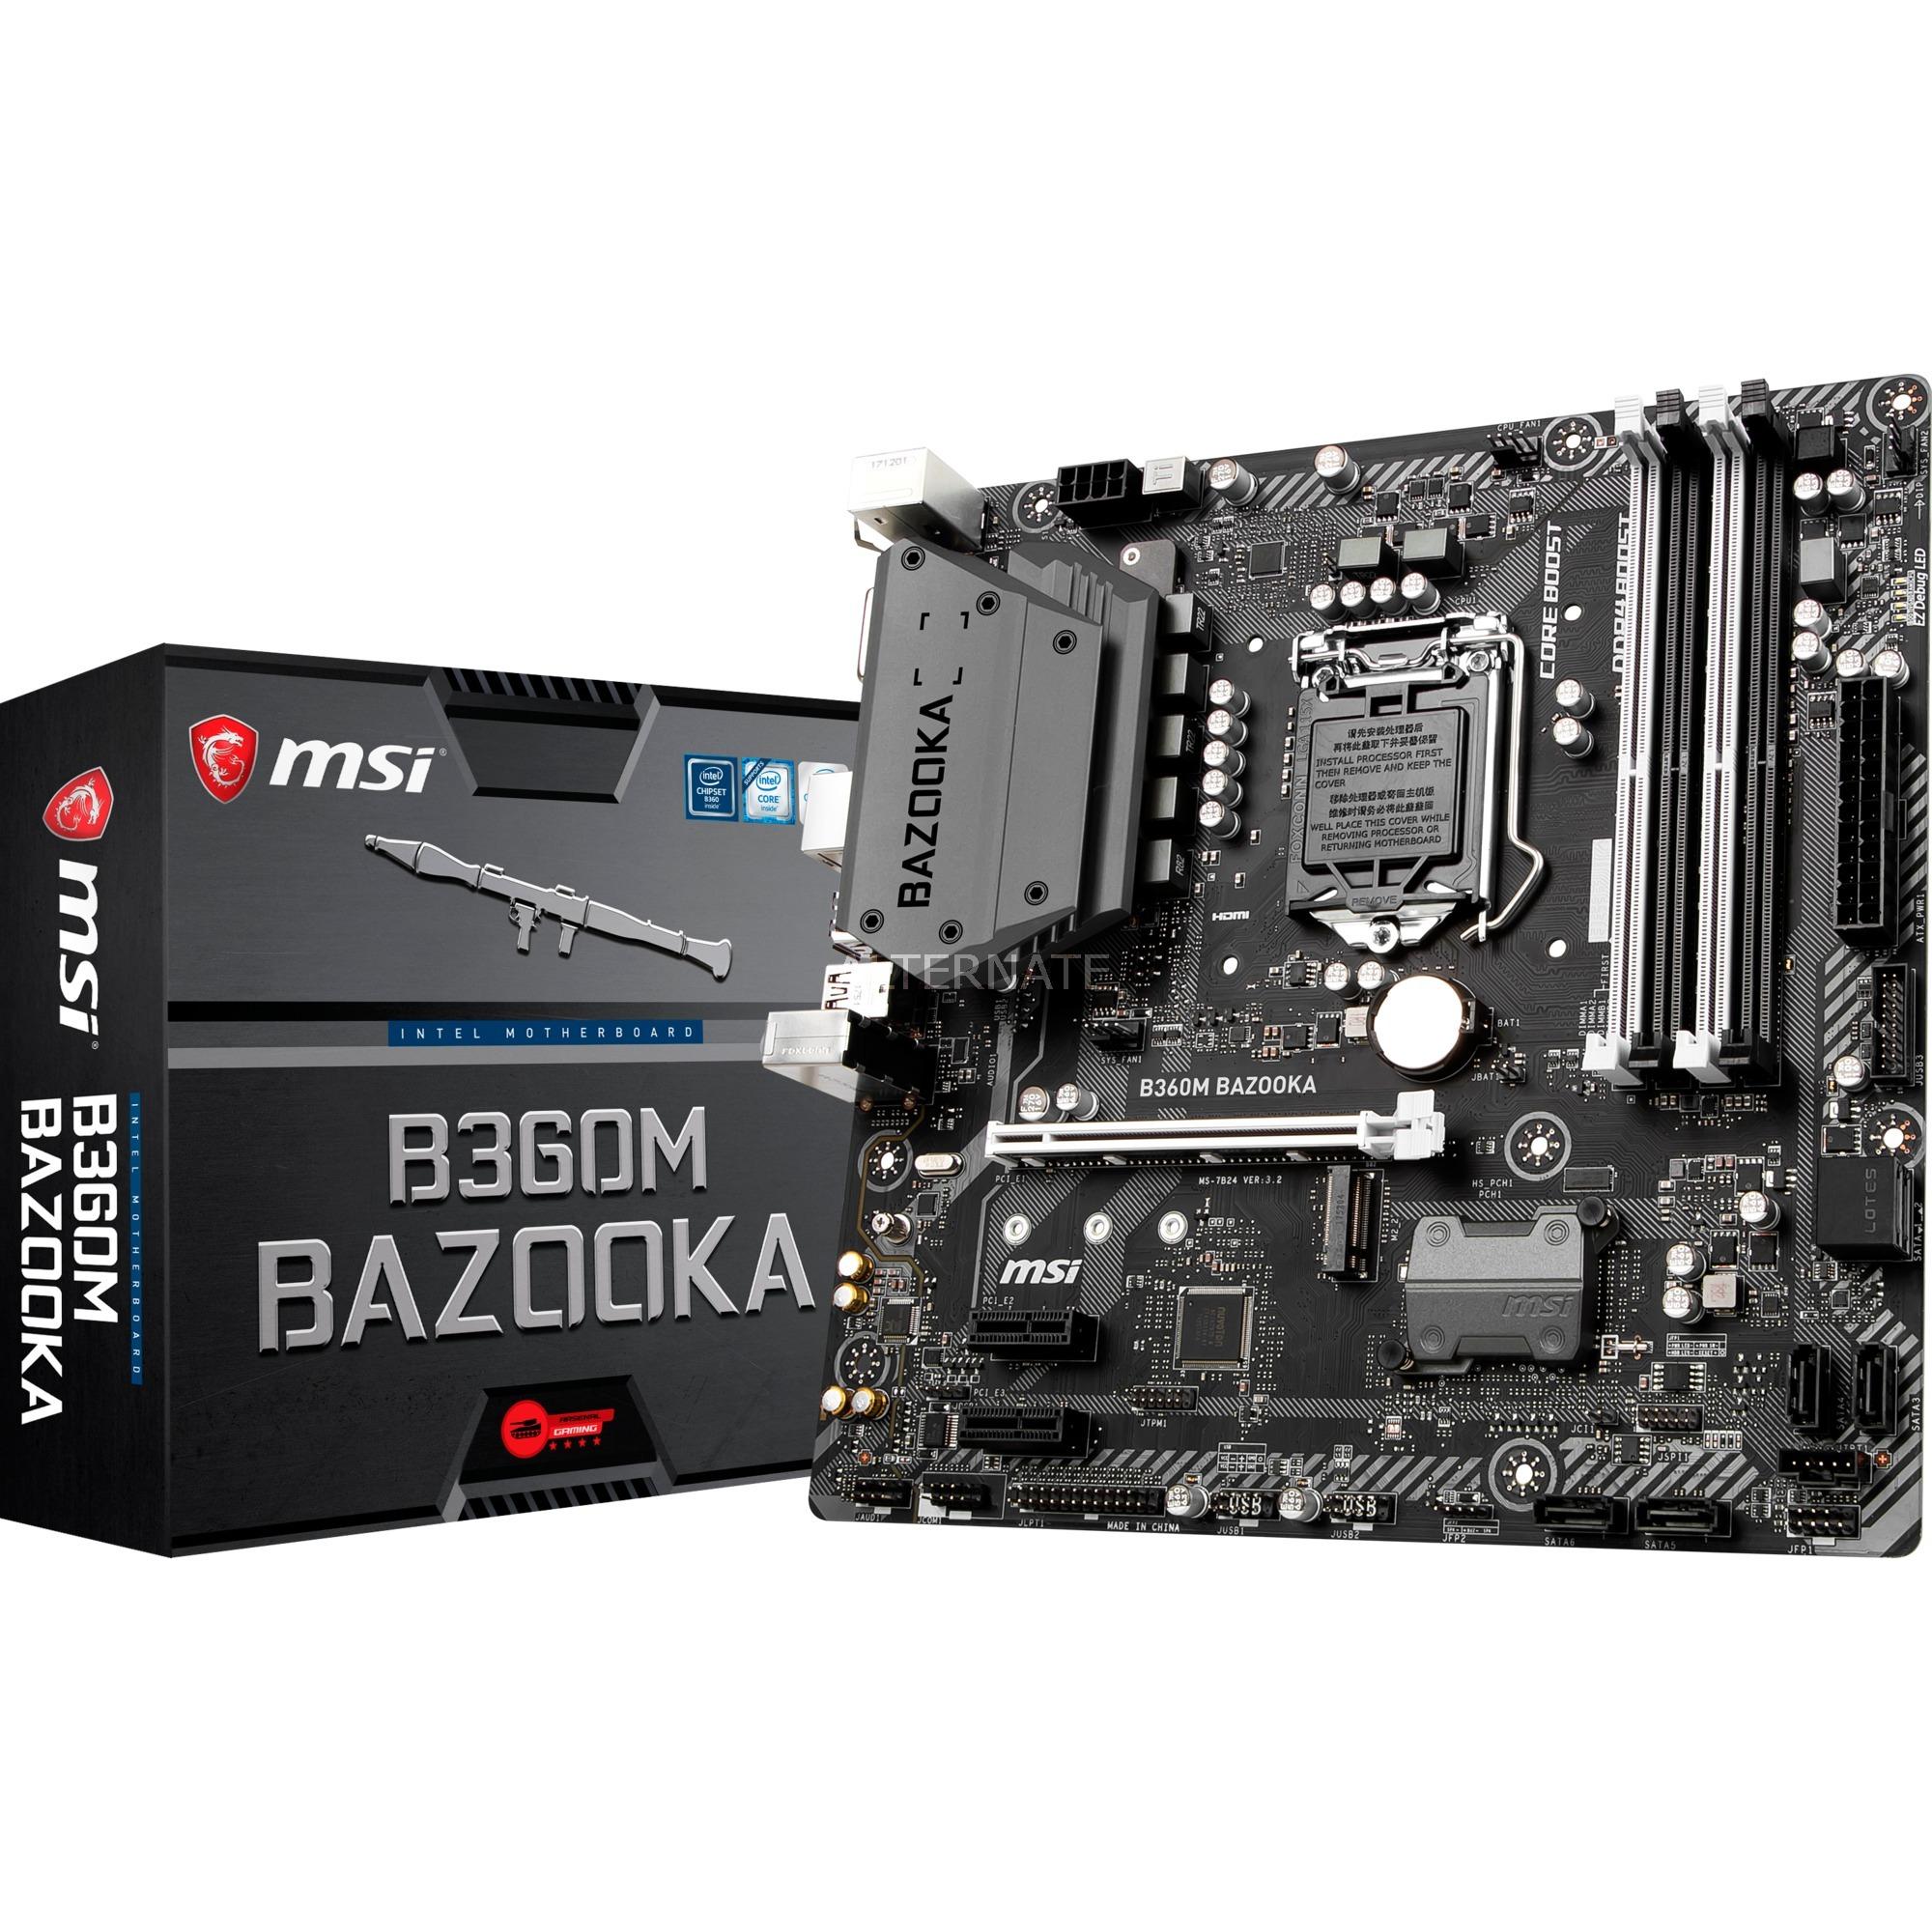 B360M BAZOOKA LGA 1151 (Zócalo H4) Intel B360 micro ATX, Placa base